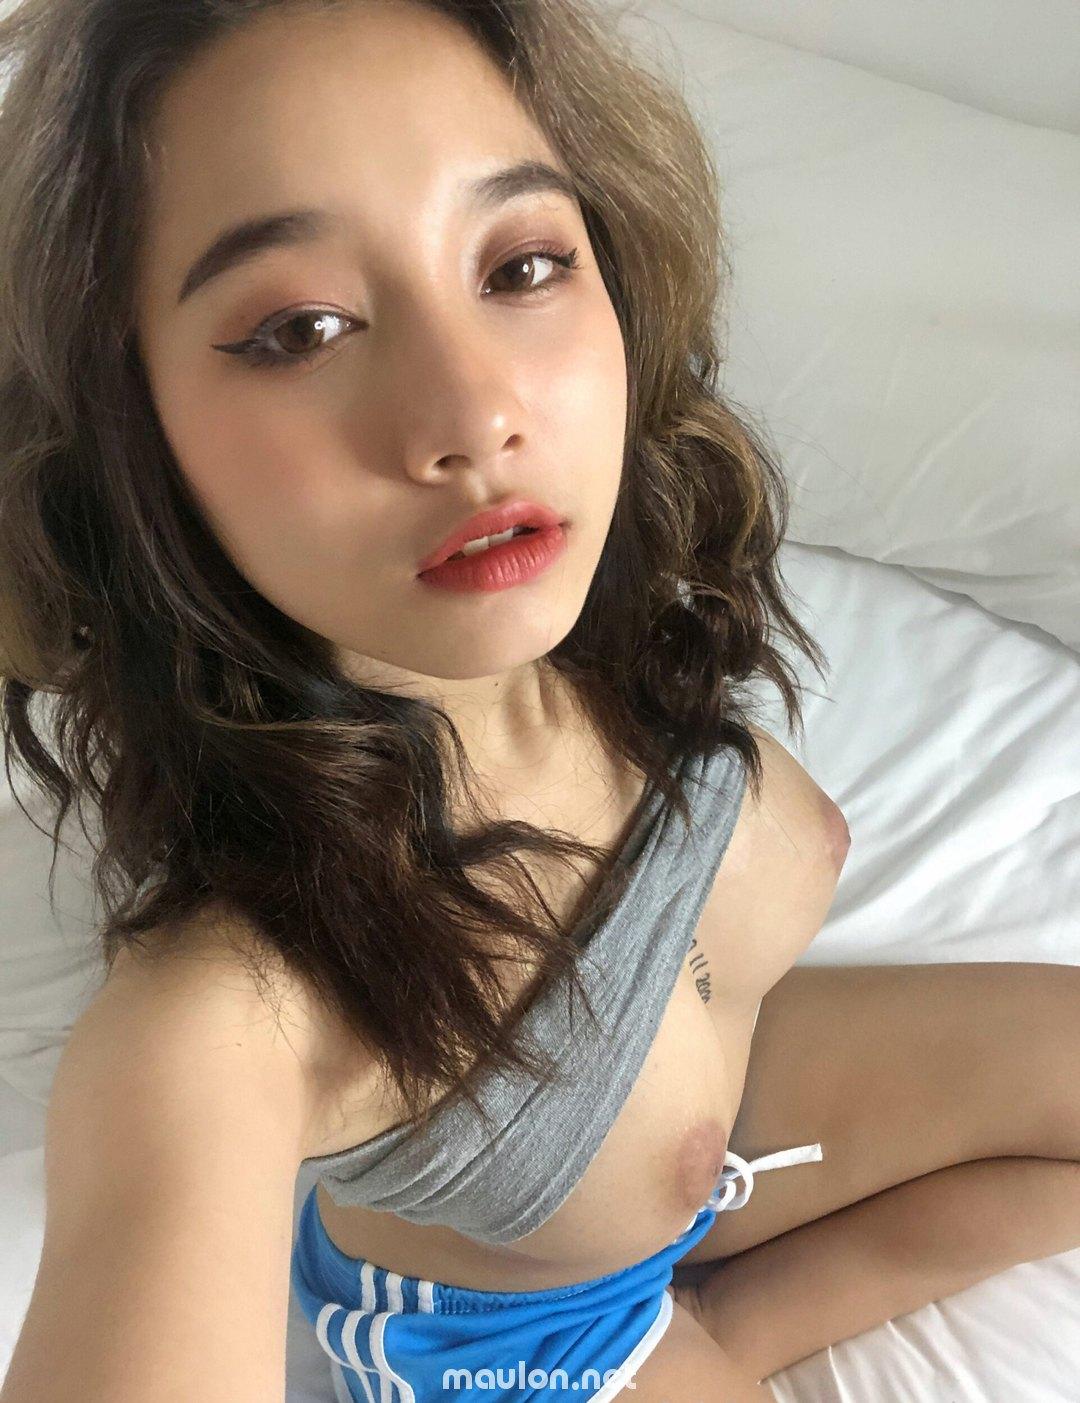 MauLon.Net - Ảnh sex girl xinh OnlyFans Irisadamsone